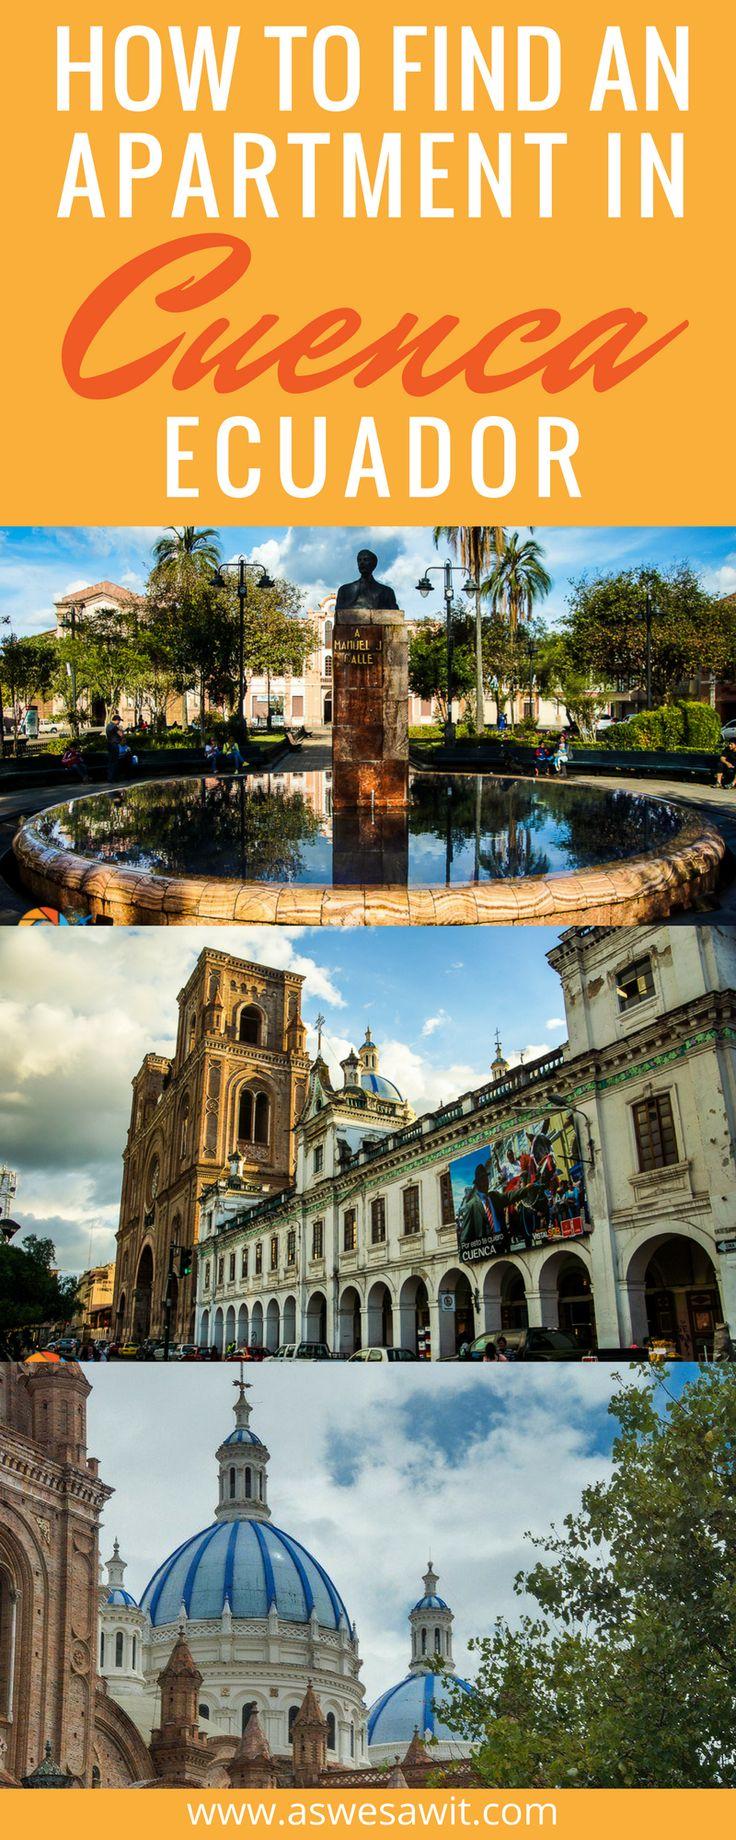 112 Best Ecuador Images On Pinterest Caterpillar City And Columbia # Muebles Relax Ecuador